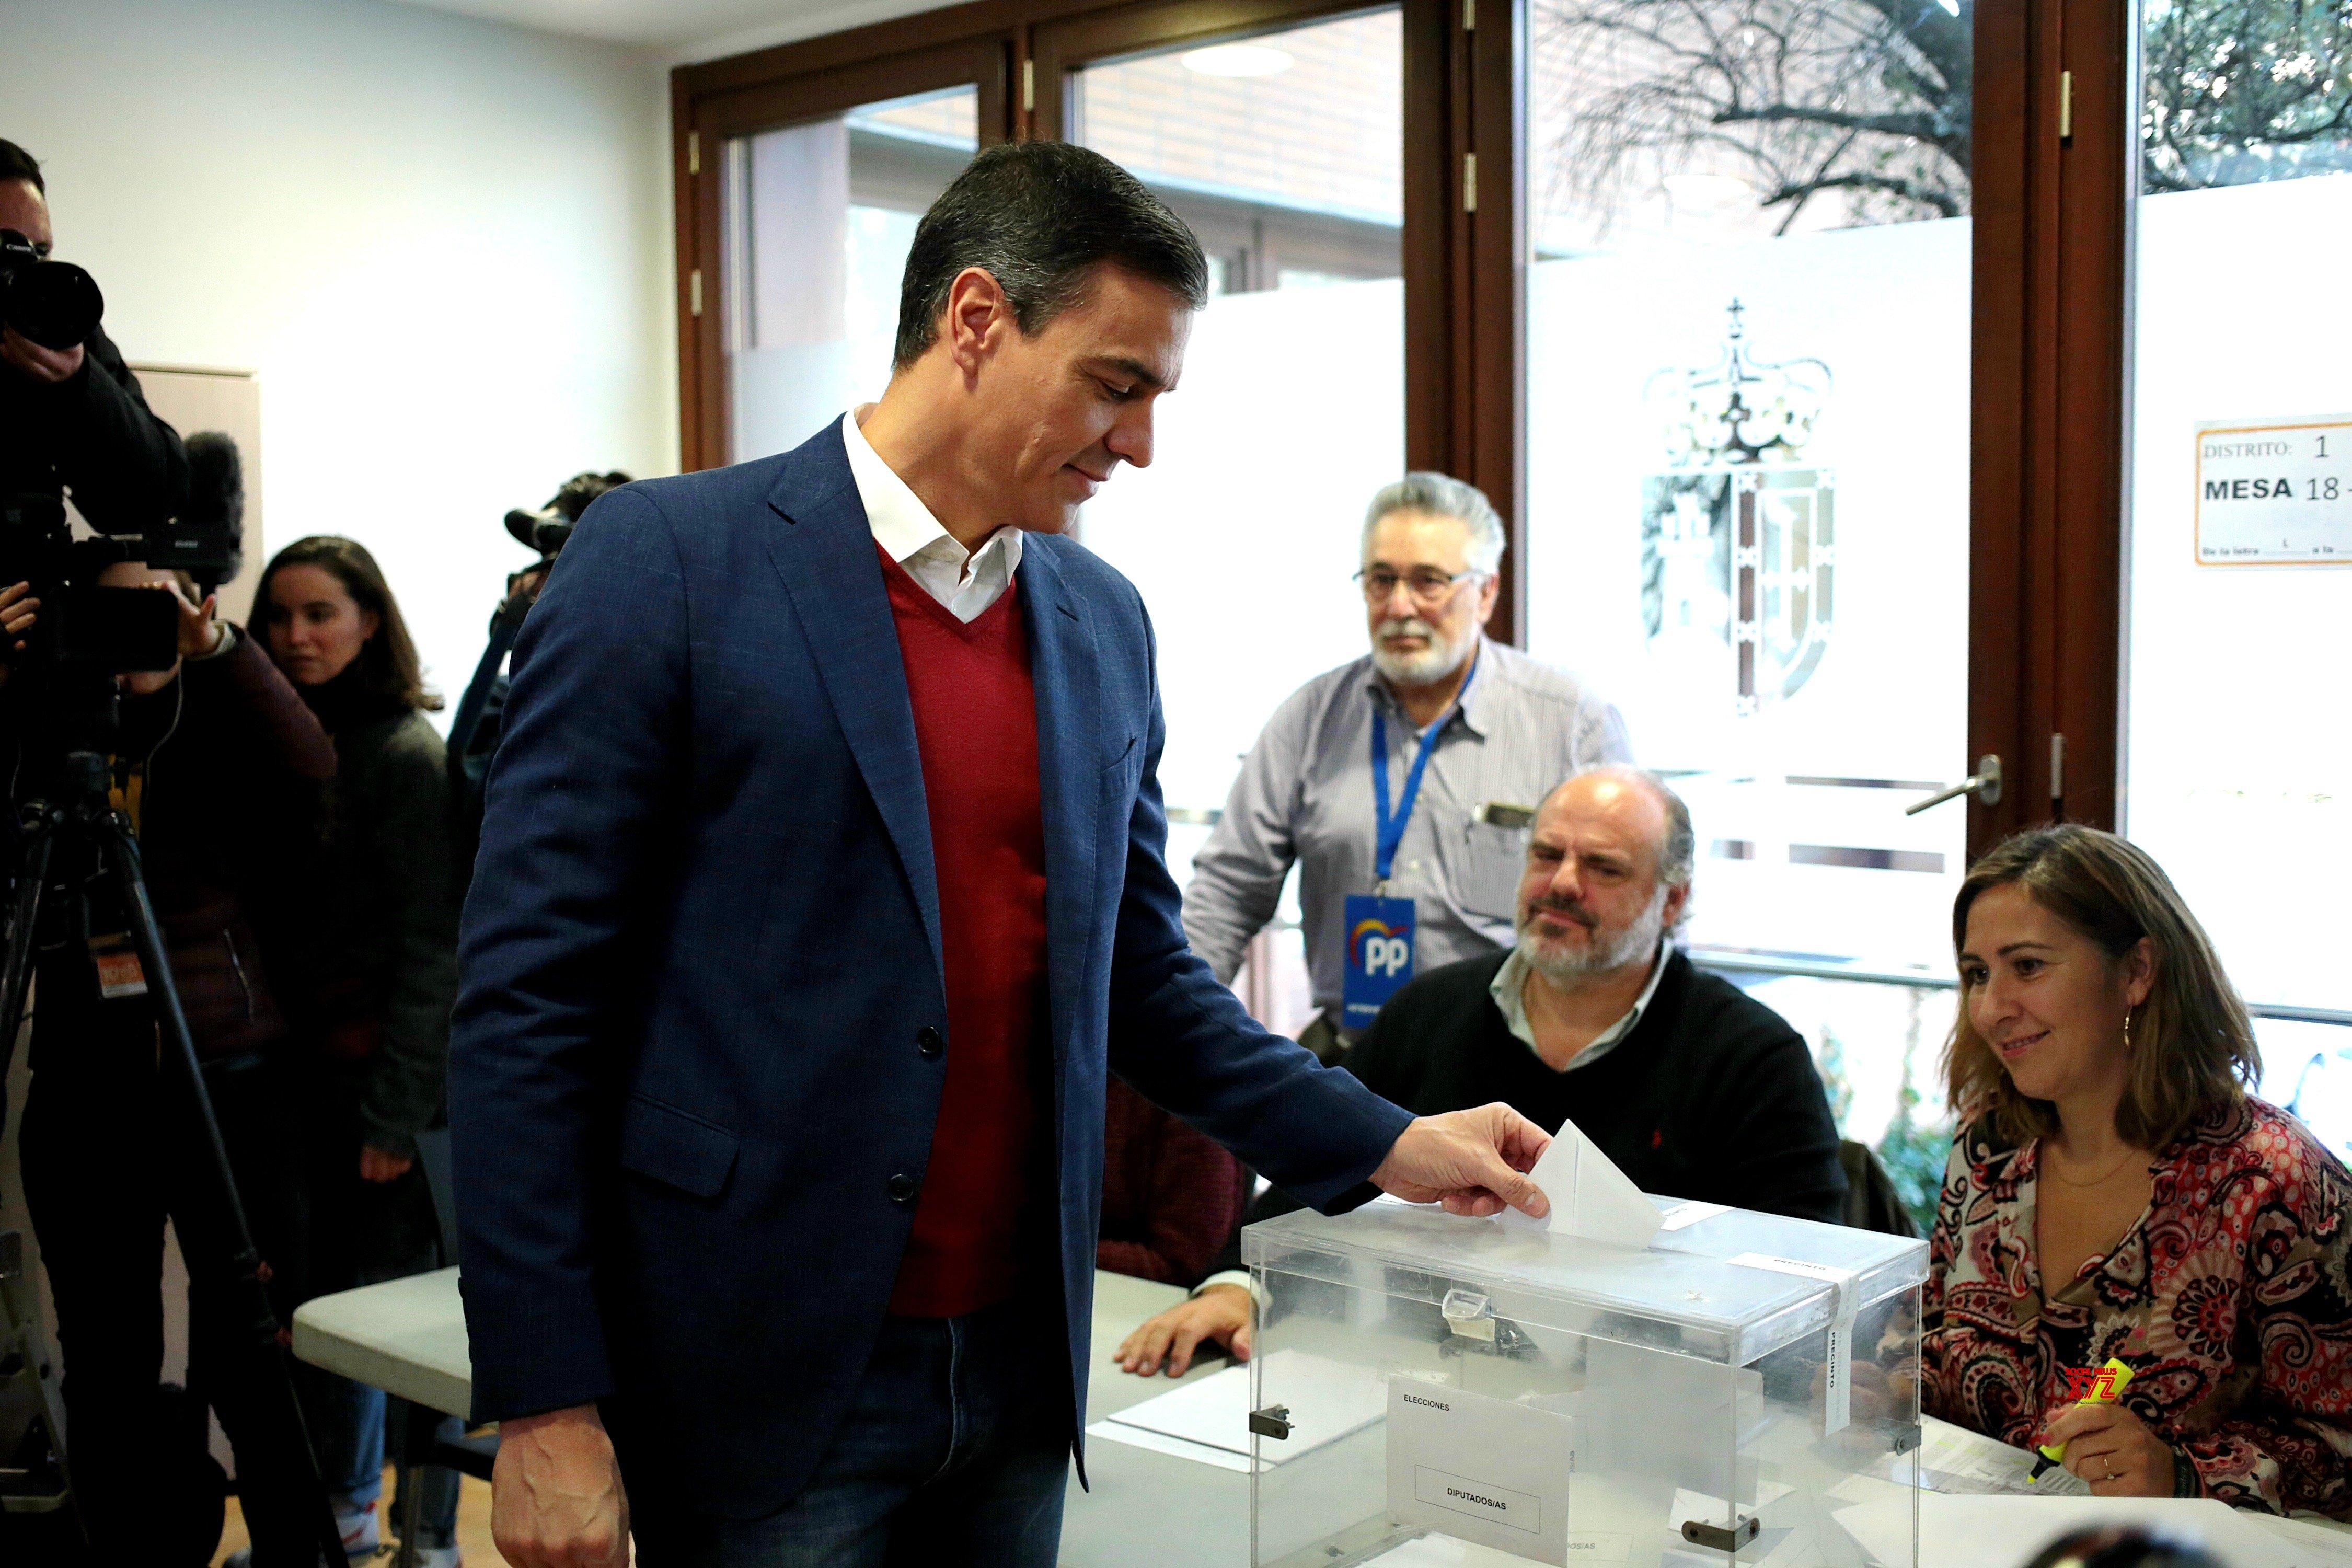 SPAIN - GENERAL ELECTION - PEDRO SANCHEZ - VOTE #Gallery